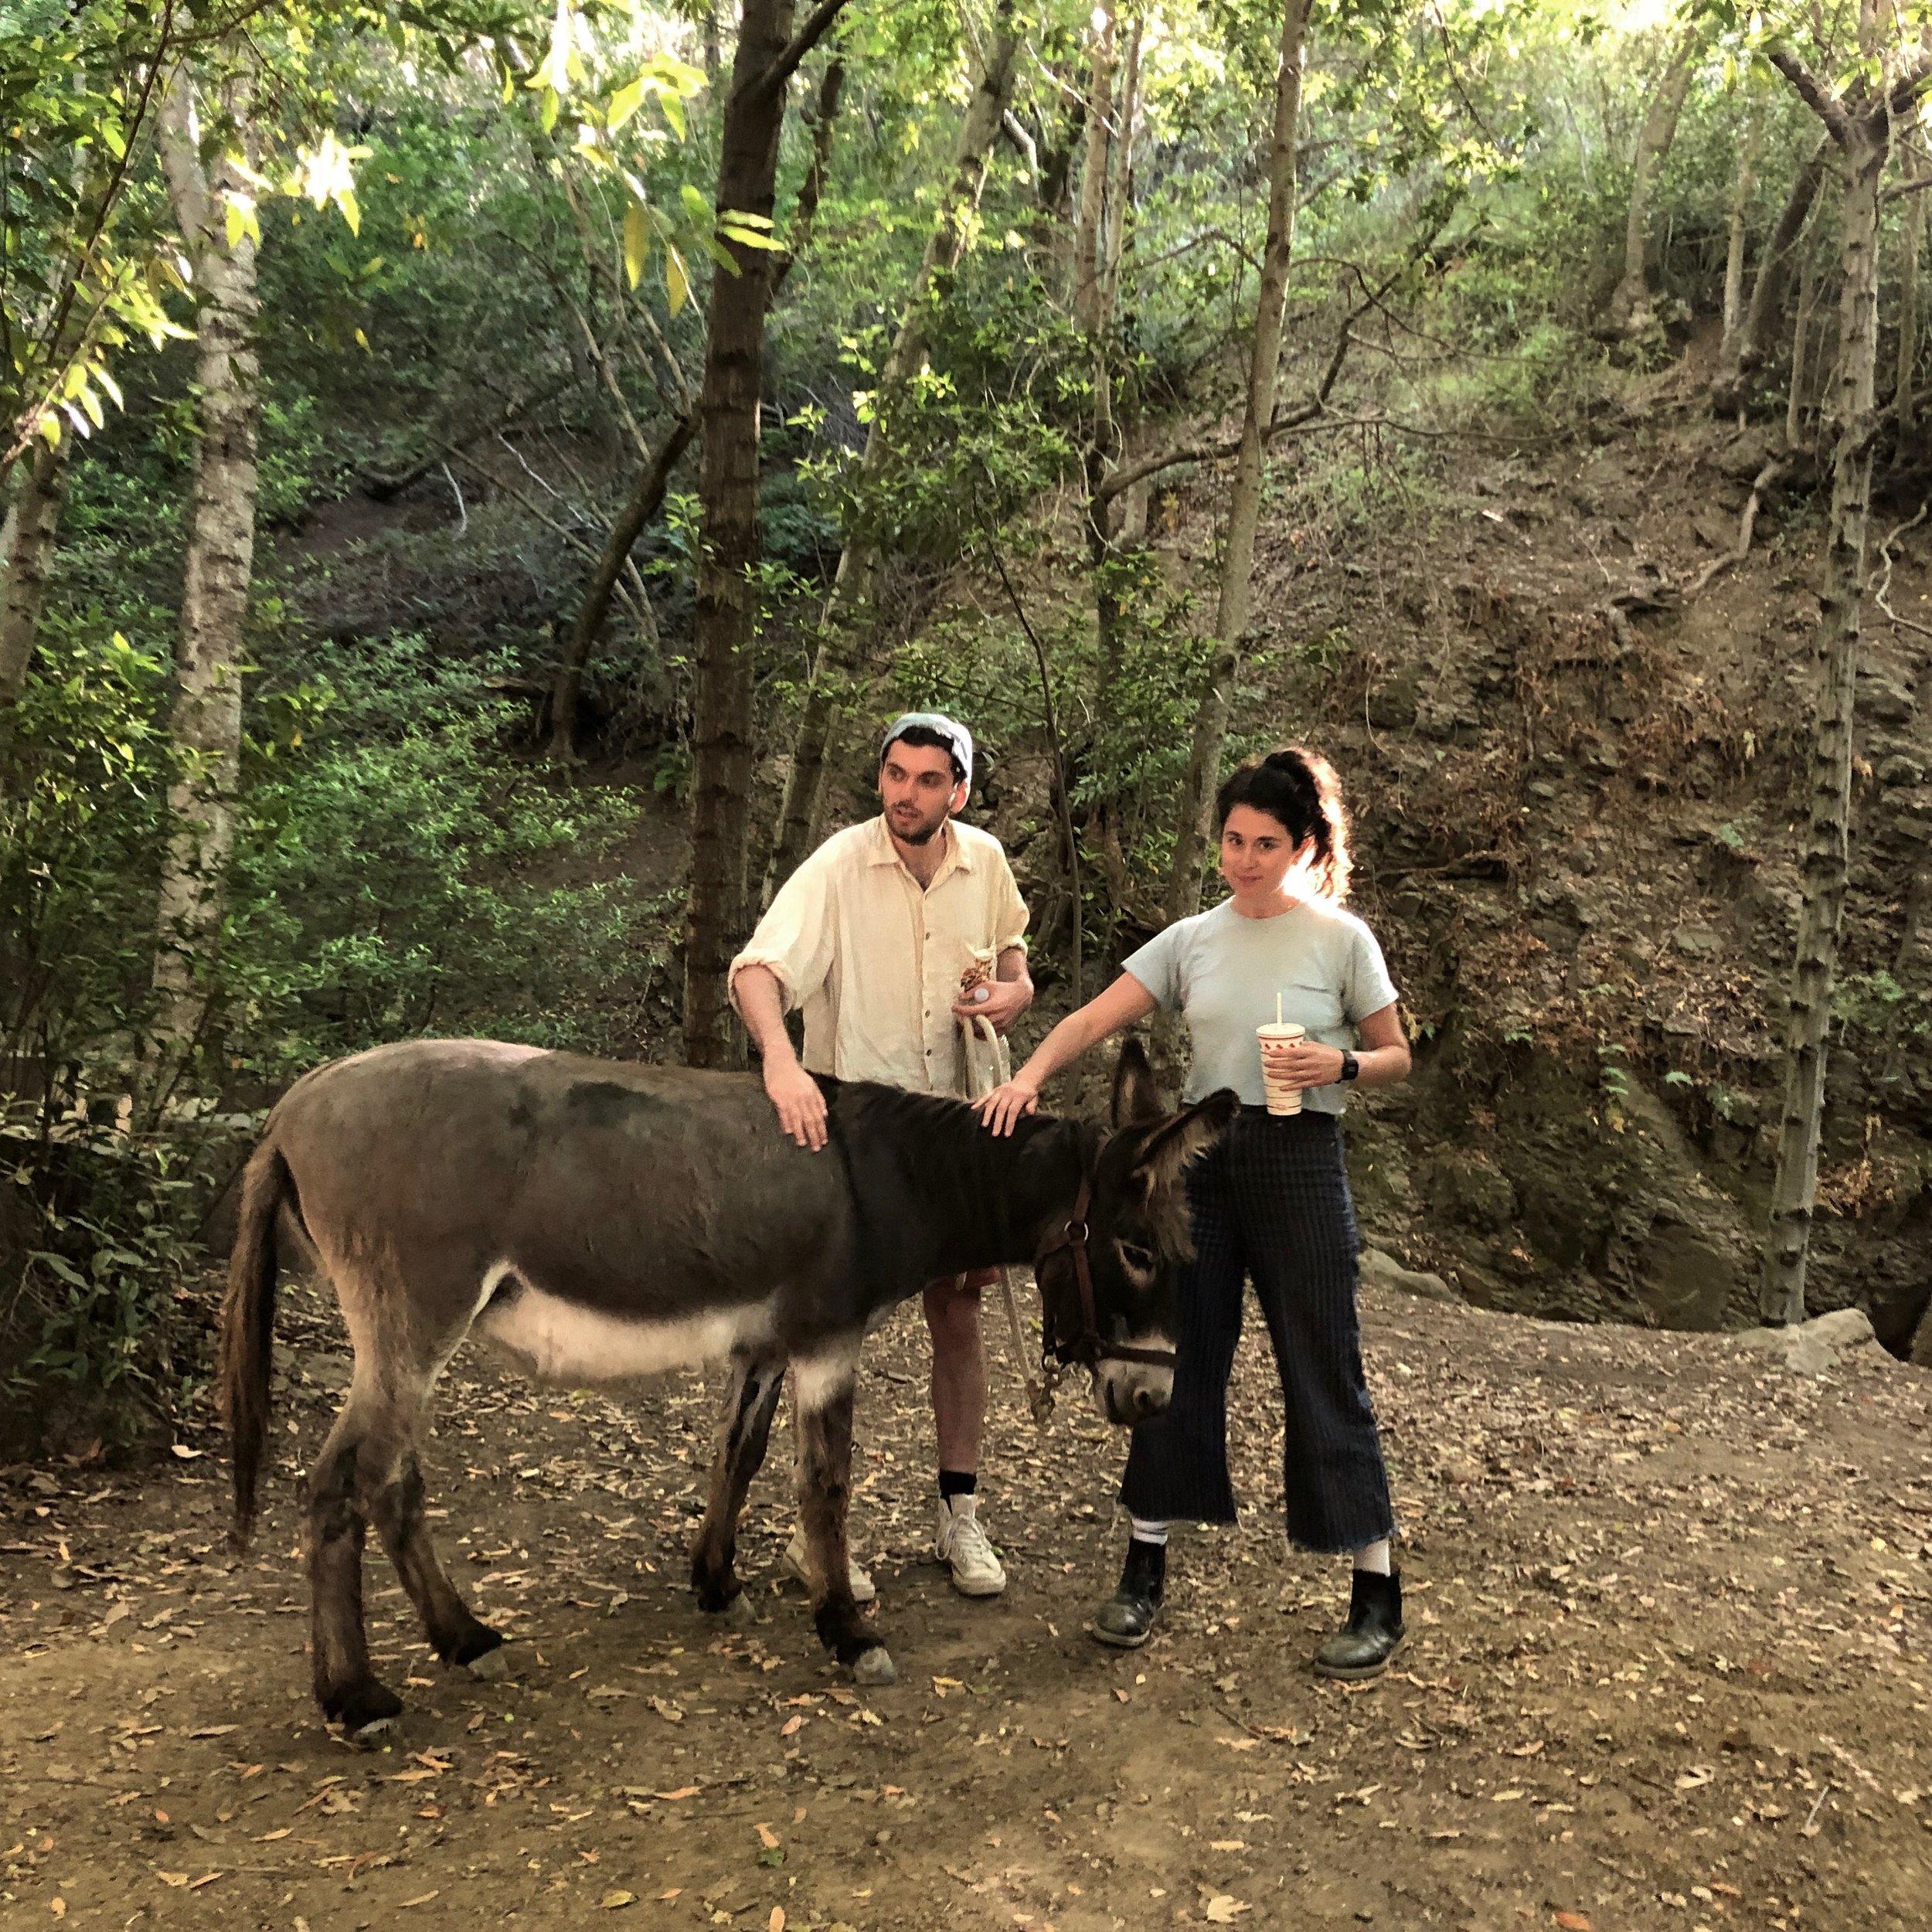 Writers & Directors Raphael Linden and Susannah Greenblatt appreciating Juanita the Donkey